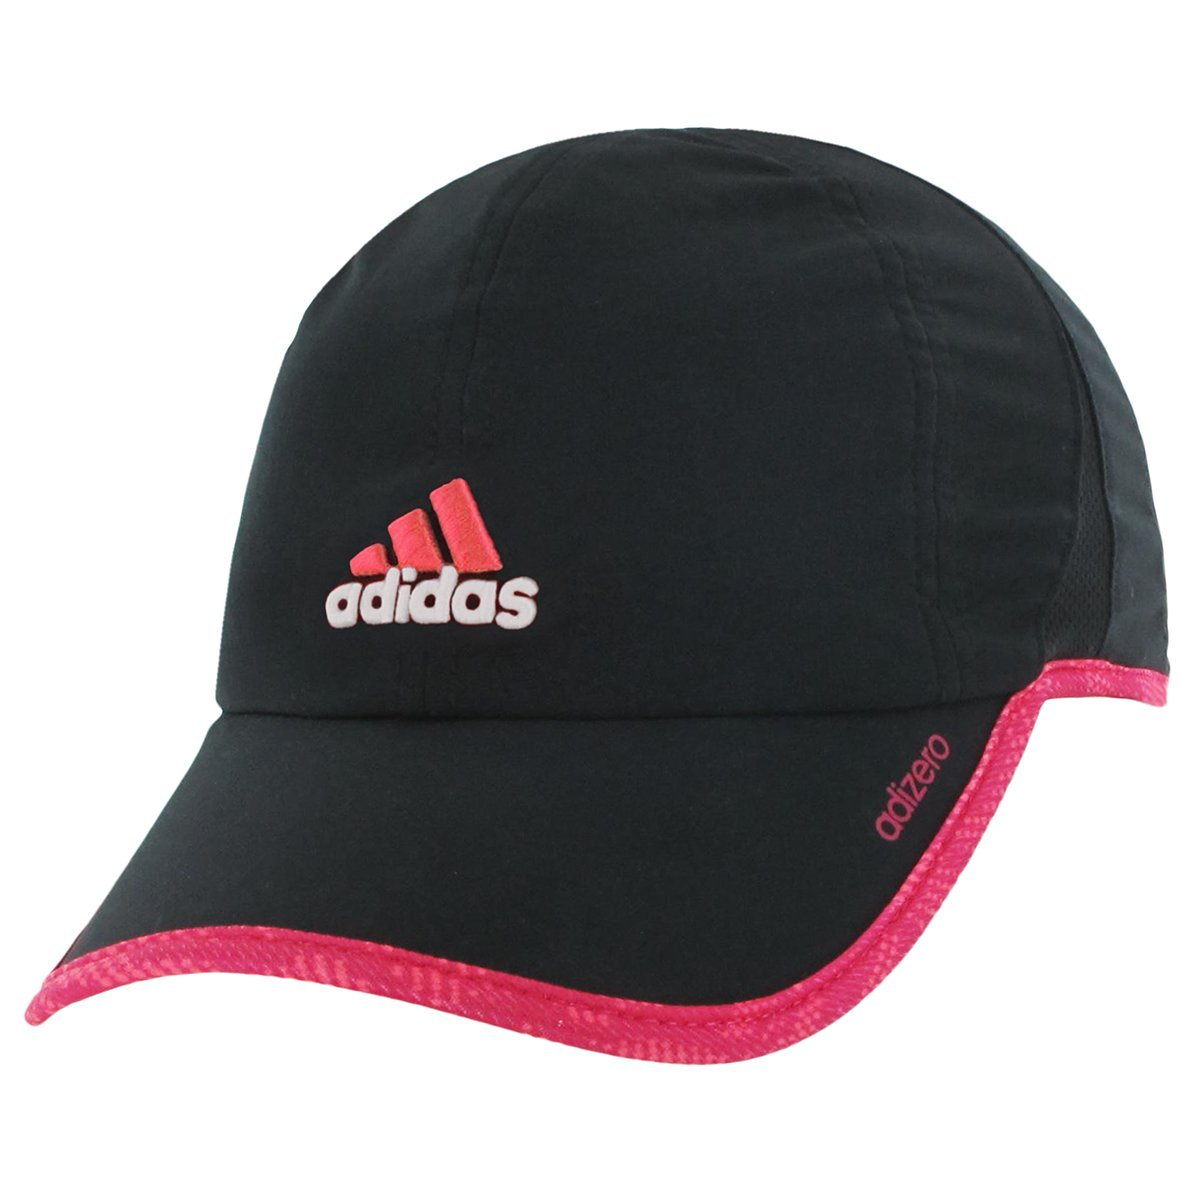 adidas cap amazon.com: adidas womenu0027s adizero ii cap, one size, black/poison ivy bold  pink/flash red ULZXJGX